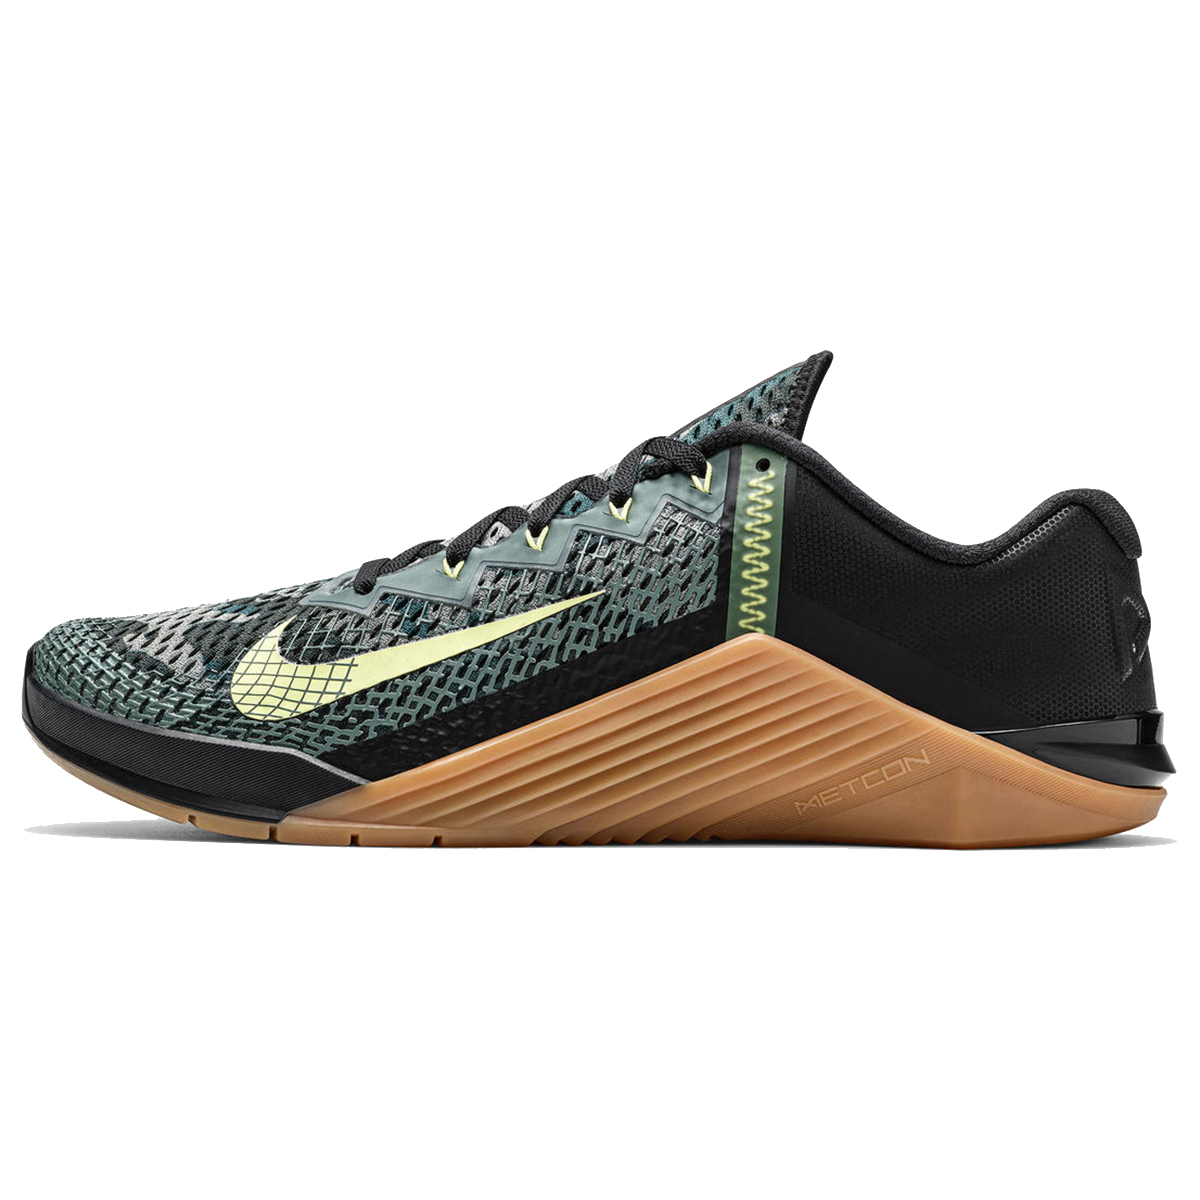 Men's Nike Metcon 6 Training Shoes - Color: Valerian Blue - Size: 3.5 - Width: Regular, Valerian Blue, large, image 2